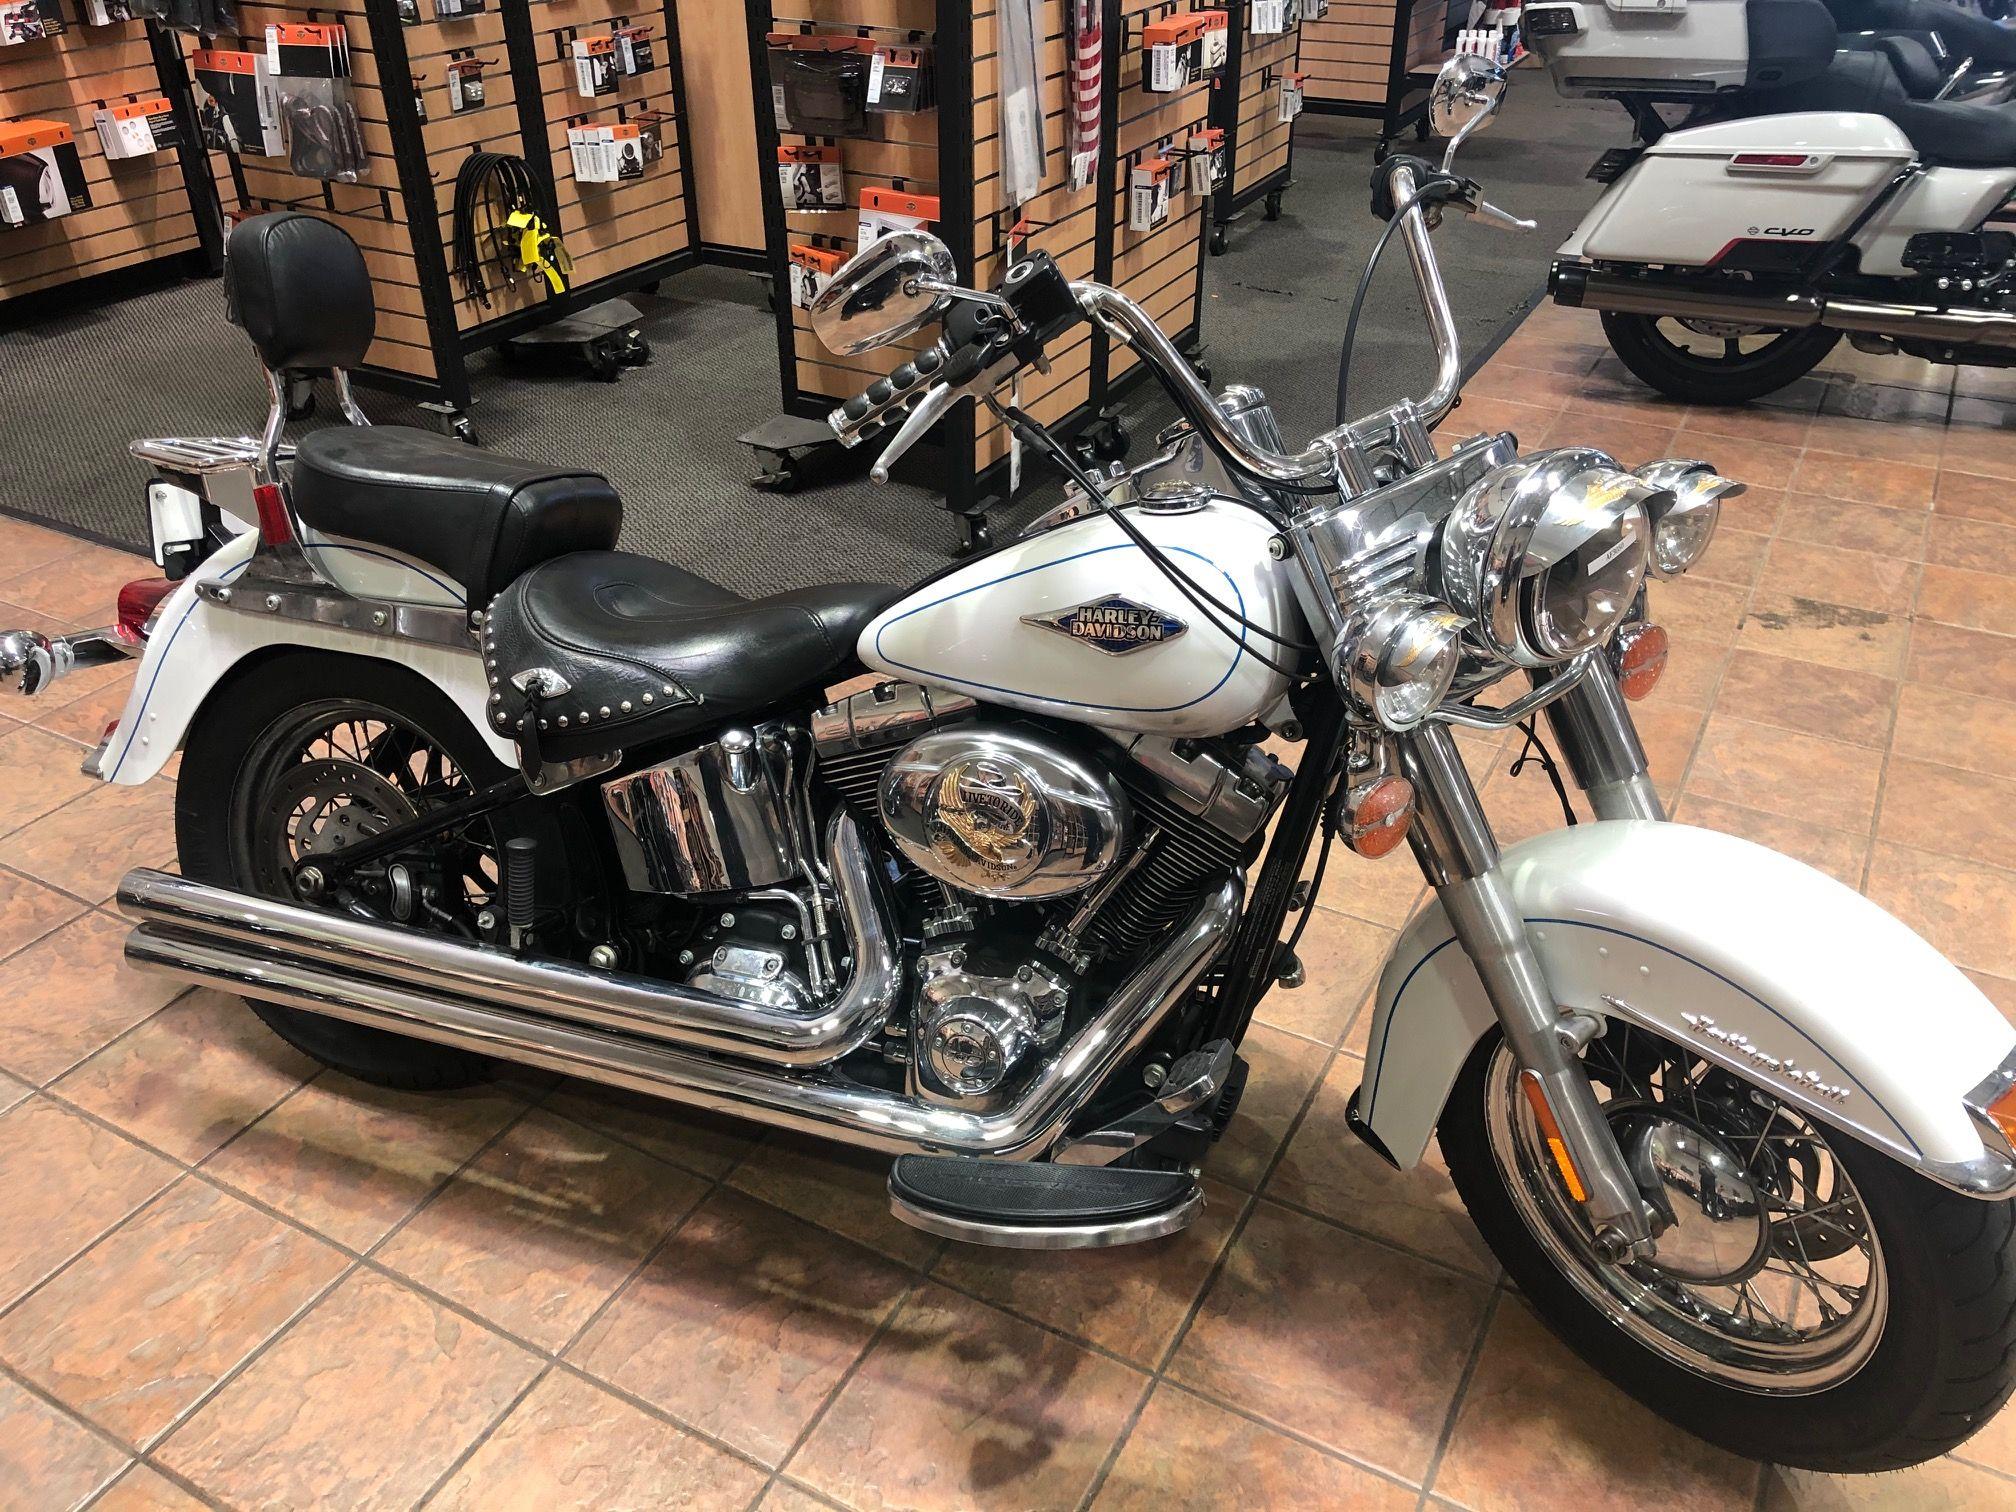 2012 Harley-Davidson Heritage Softail Classic